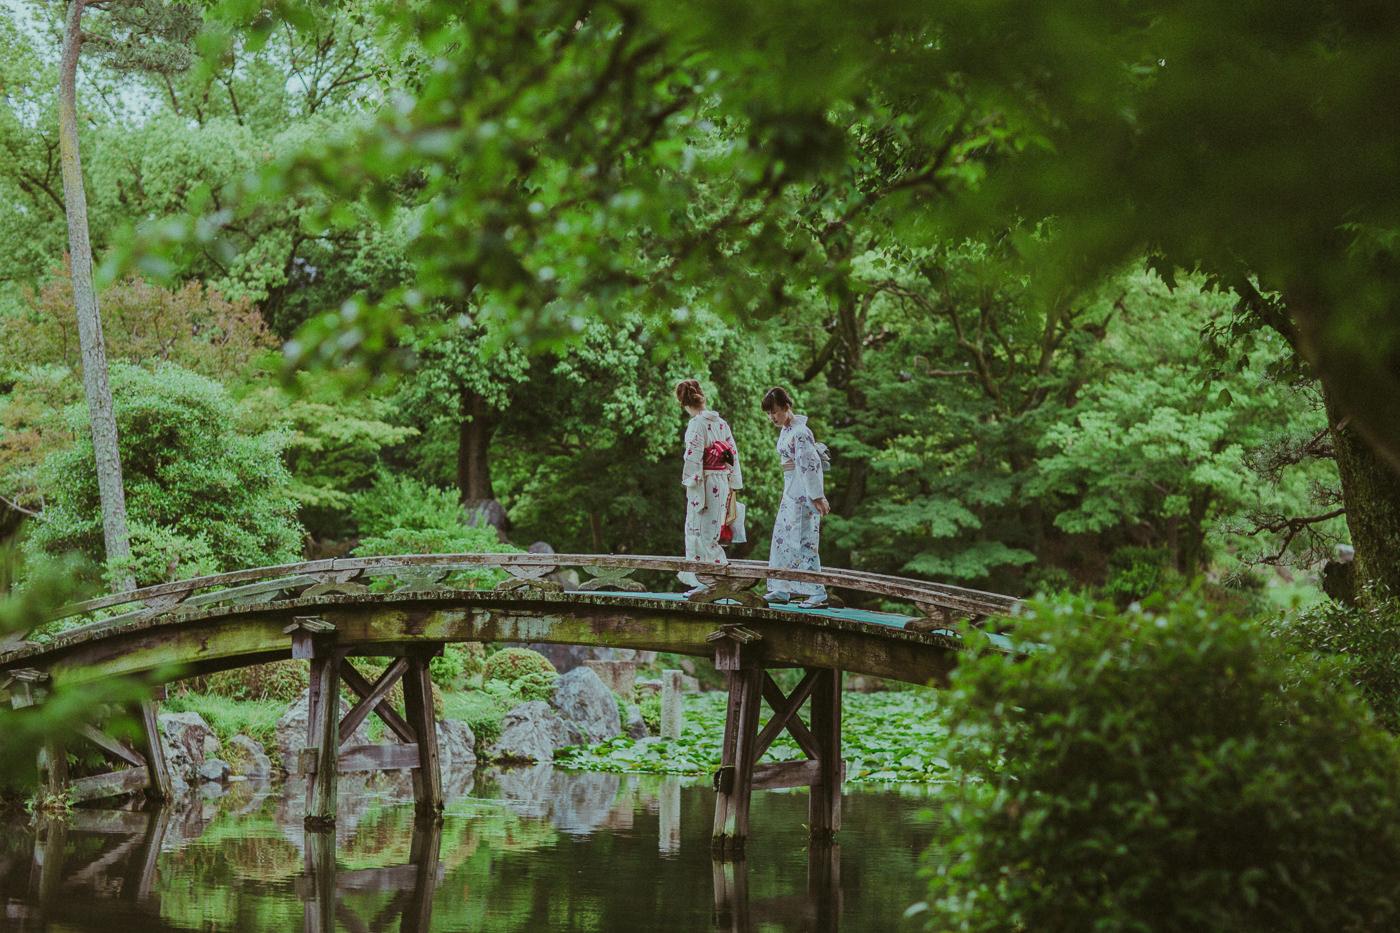 geishas in japanese garden on bridge